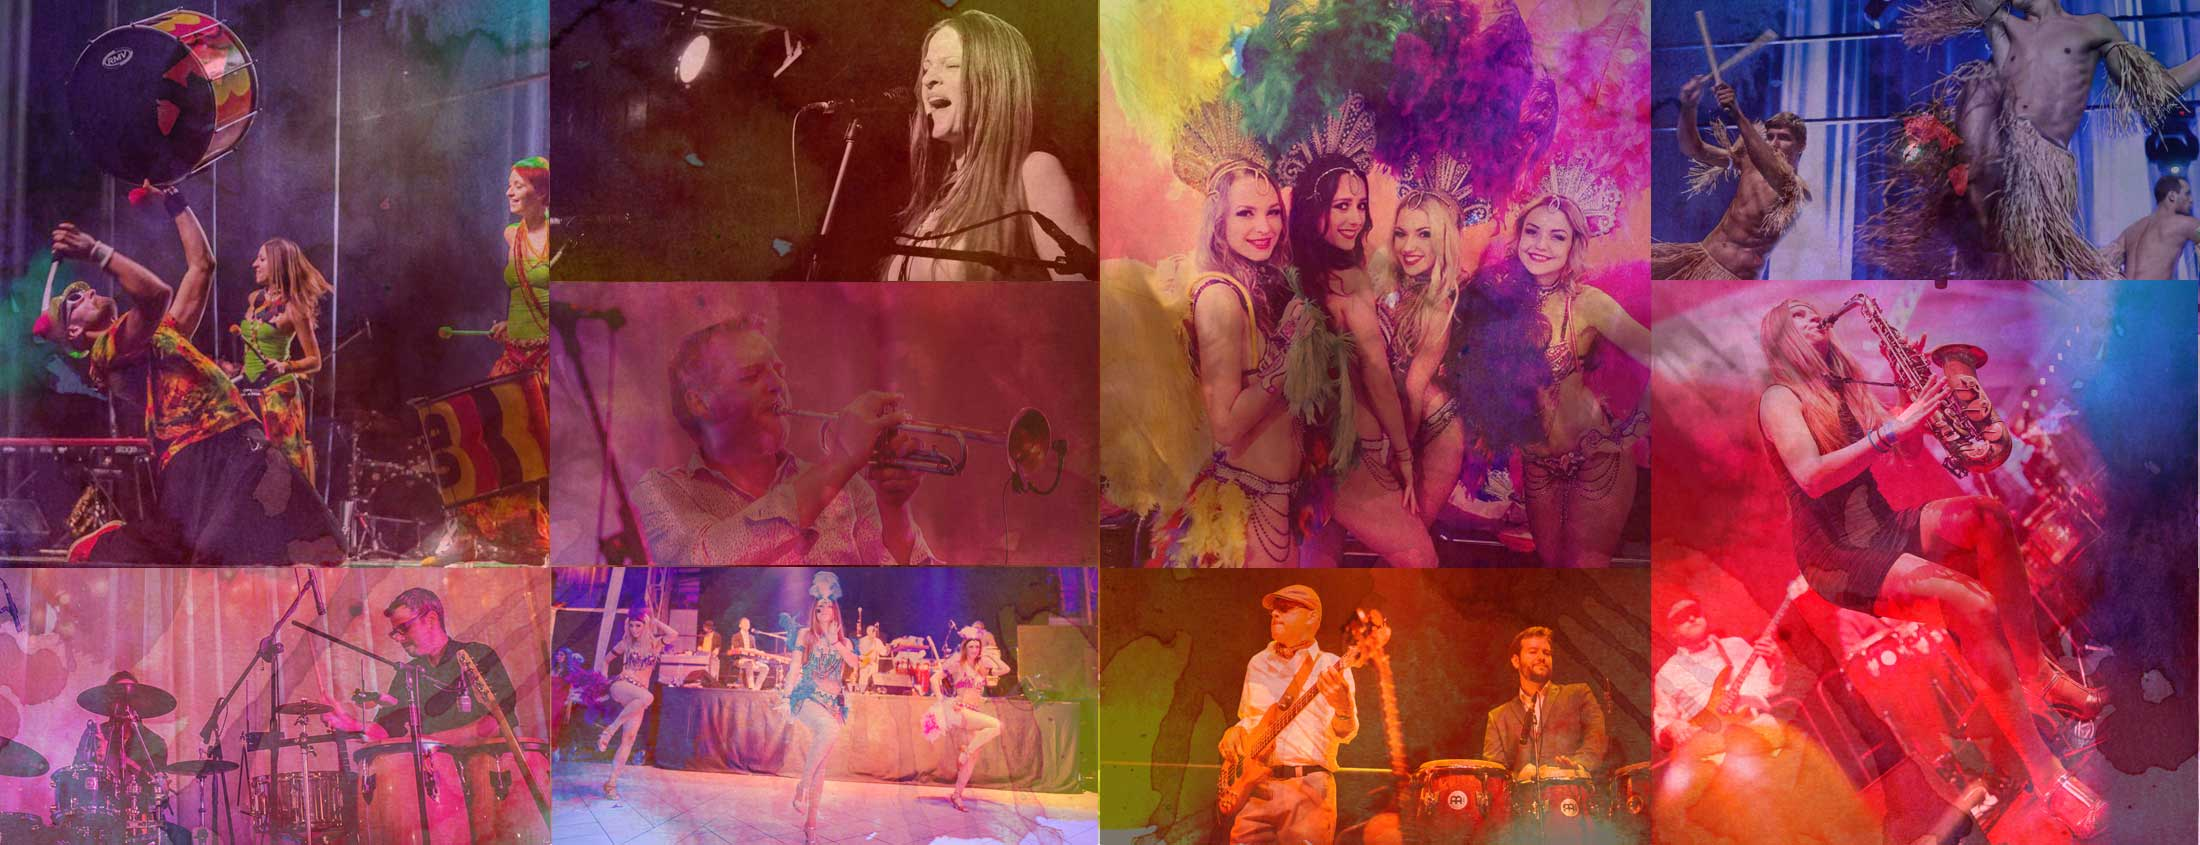 latinoshow, dominika titkova friends, afro-kubánska hudba, latino show, latinsko-americká hudba, latinsko-americké rytmy, live latino kapela, latino hudba, latino koncerty, latino event